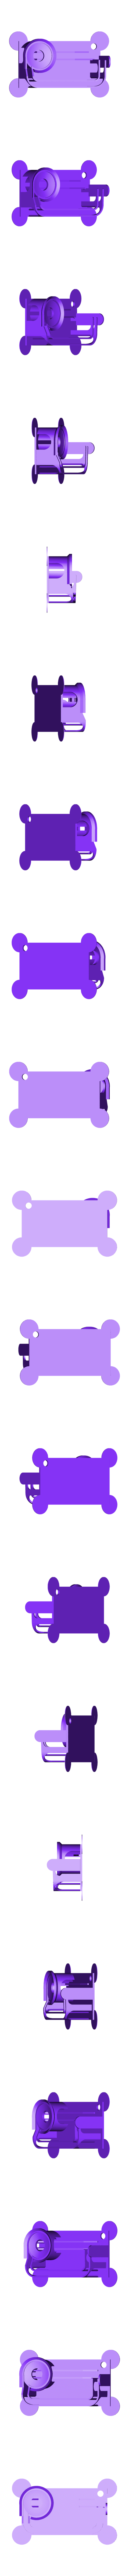 "Track_Bowl_1.stl Download free STL file Marblevator ""Mini"", Bowl Edition • 3D printer object, gzumwalt"